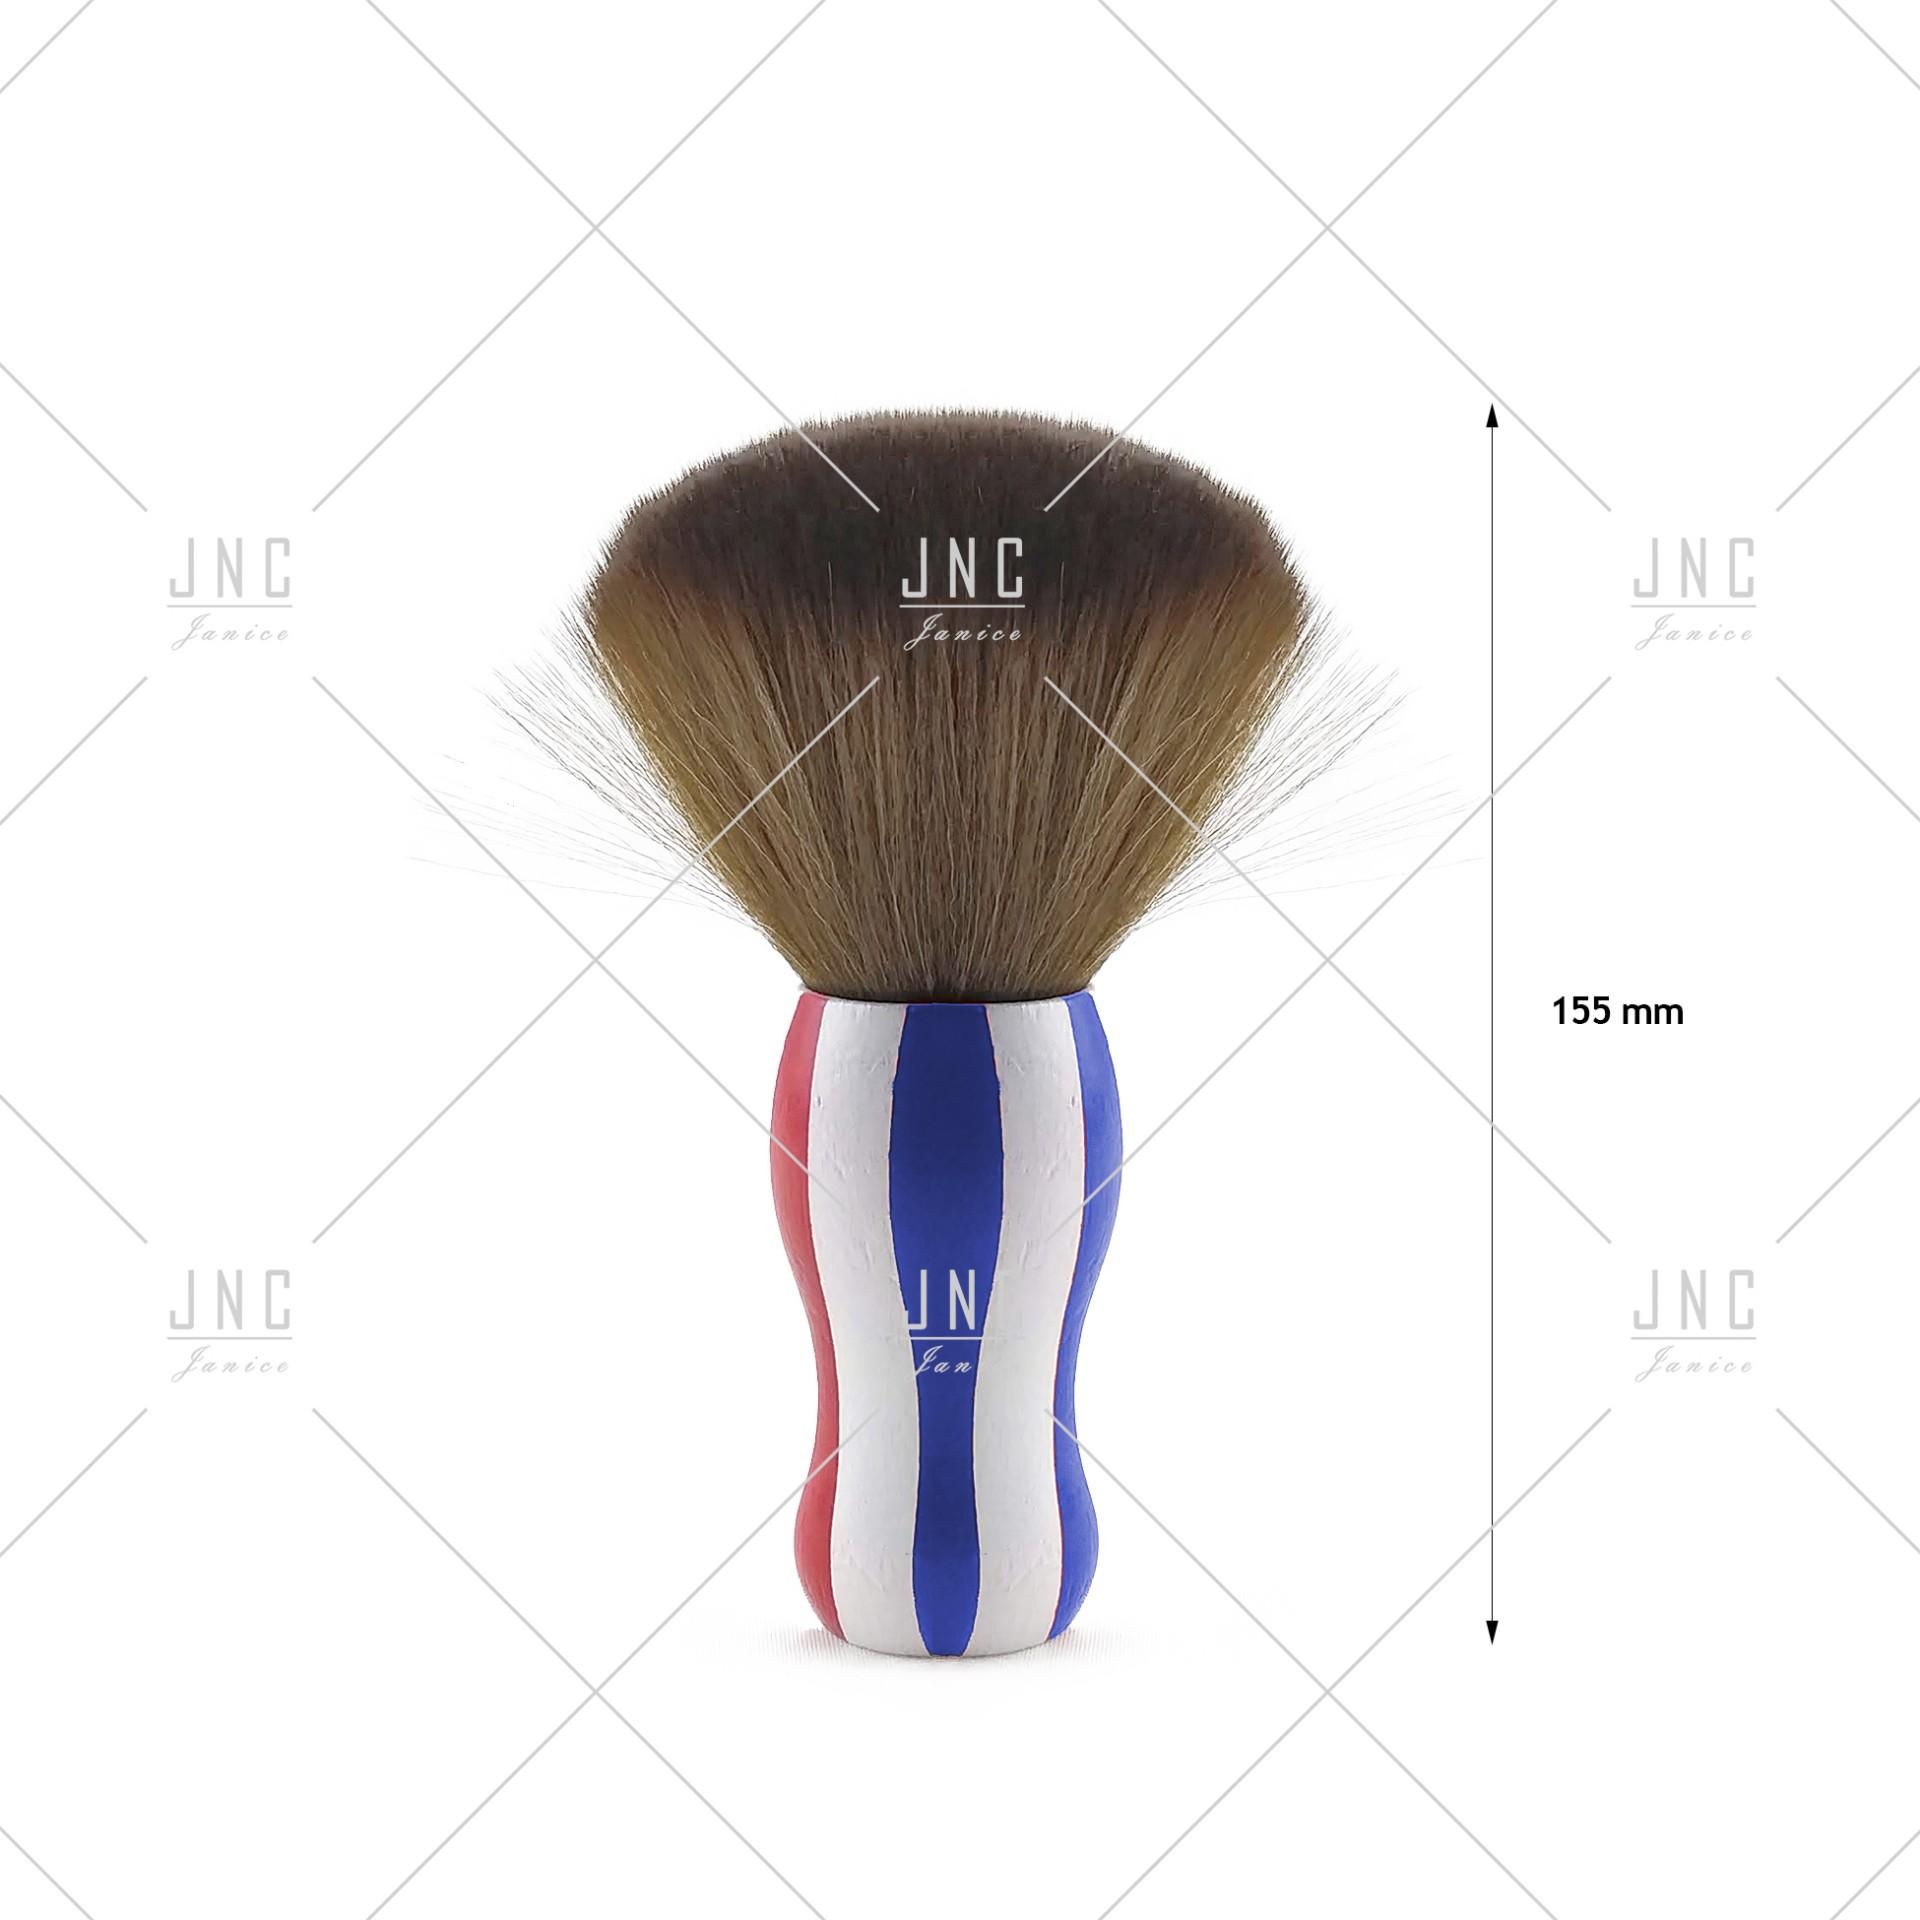 Pincel de Barbear | REF.862453